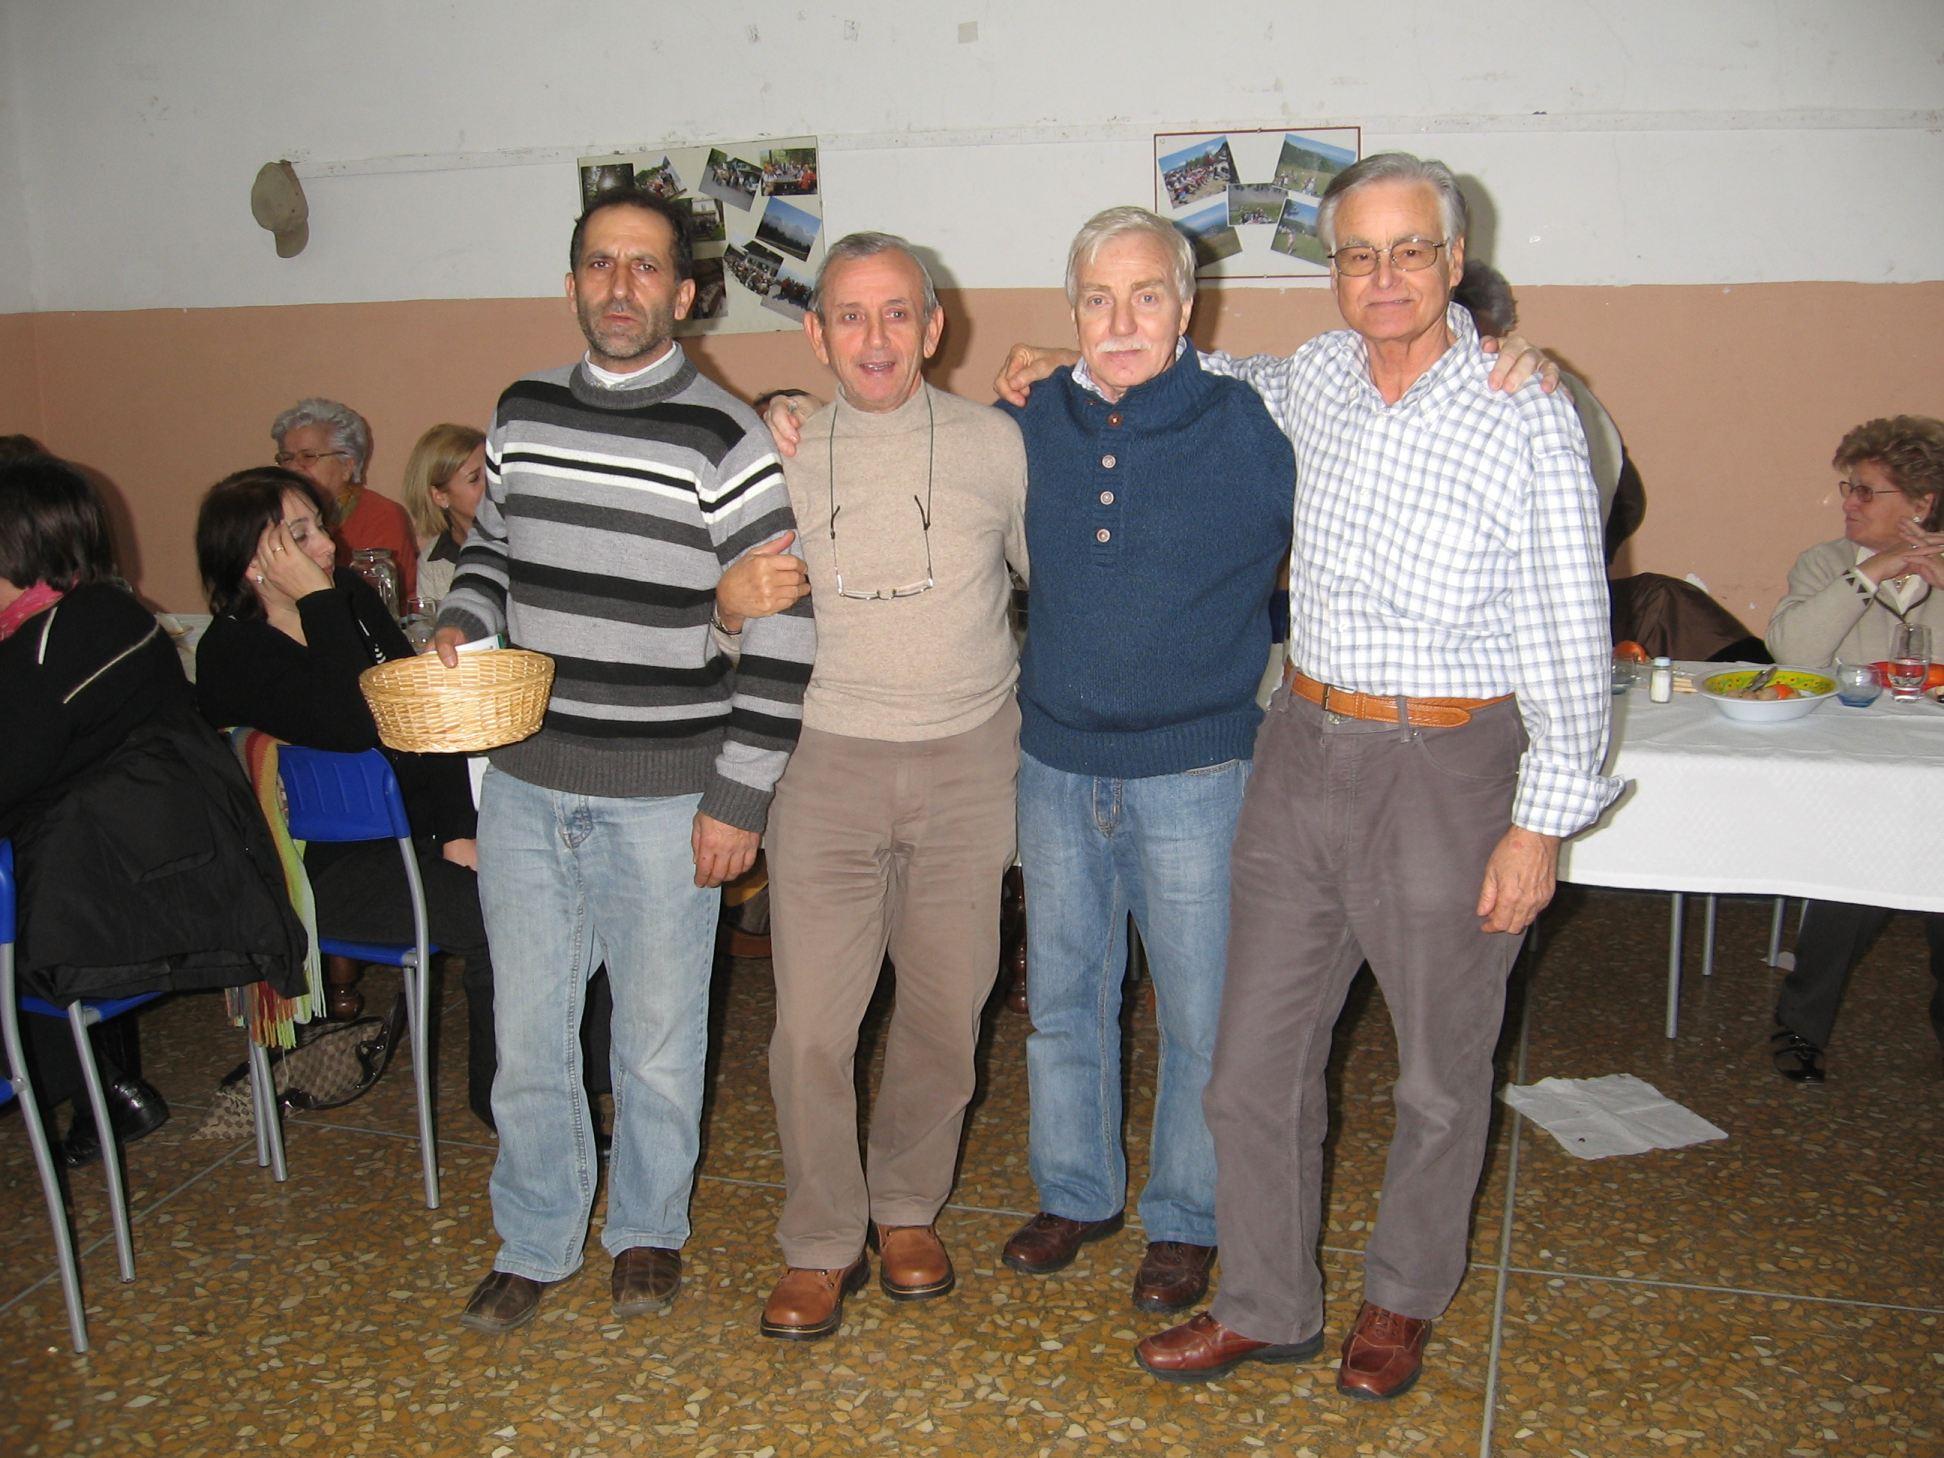 Pranzo_Comunitario-2009-12-19--14.19.21